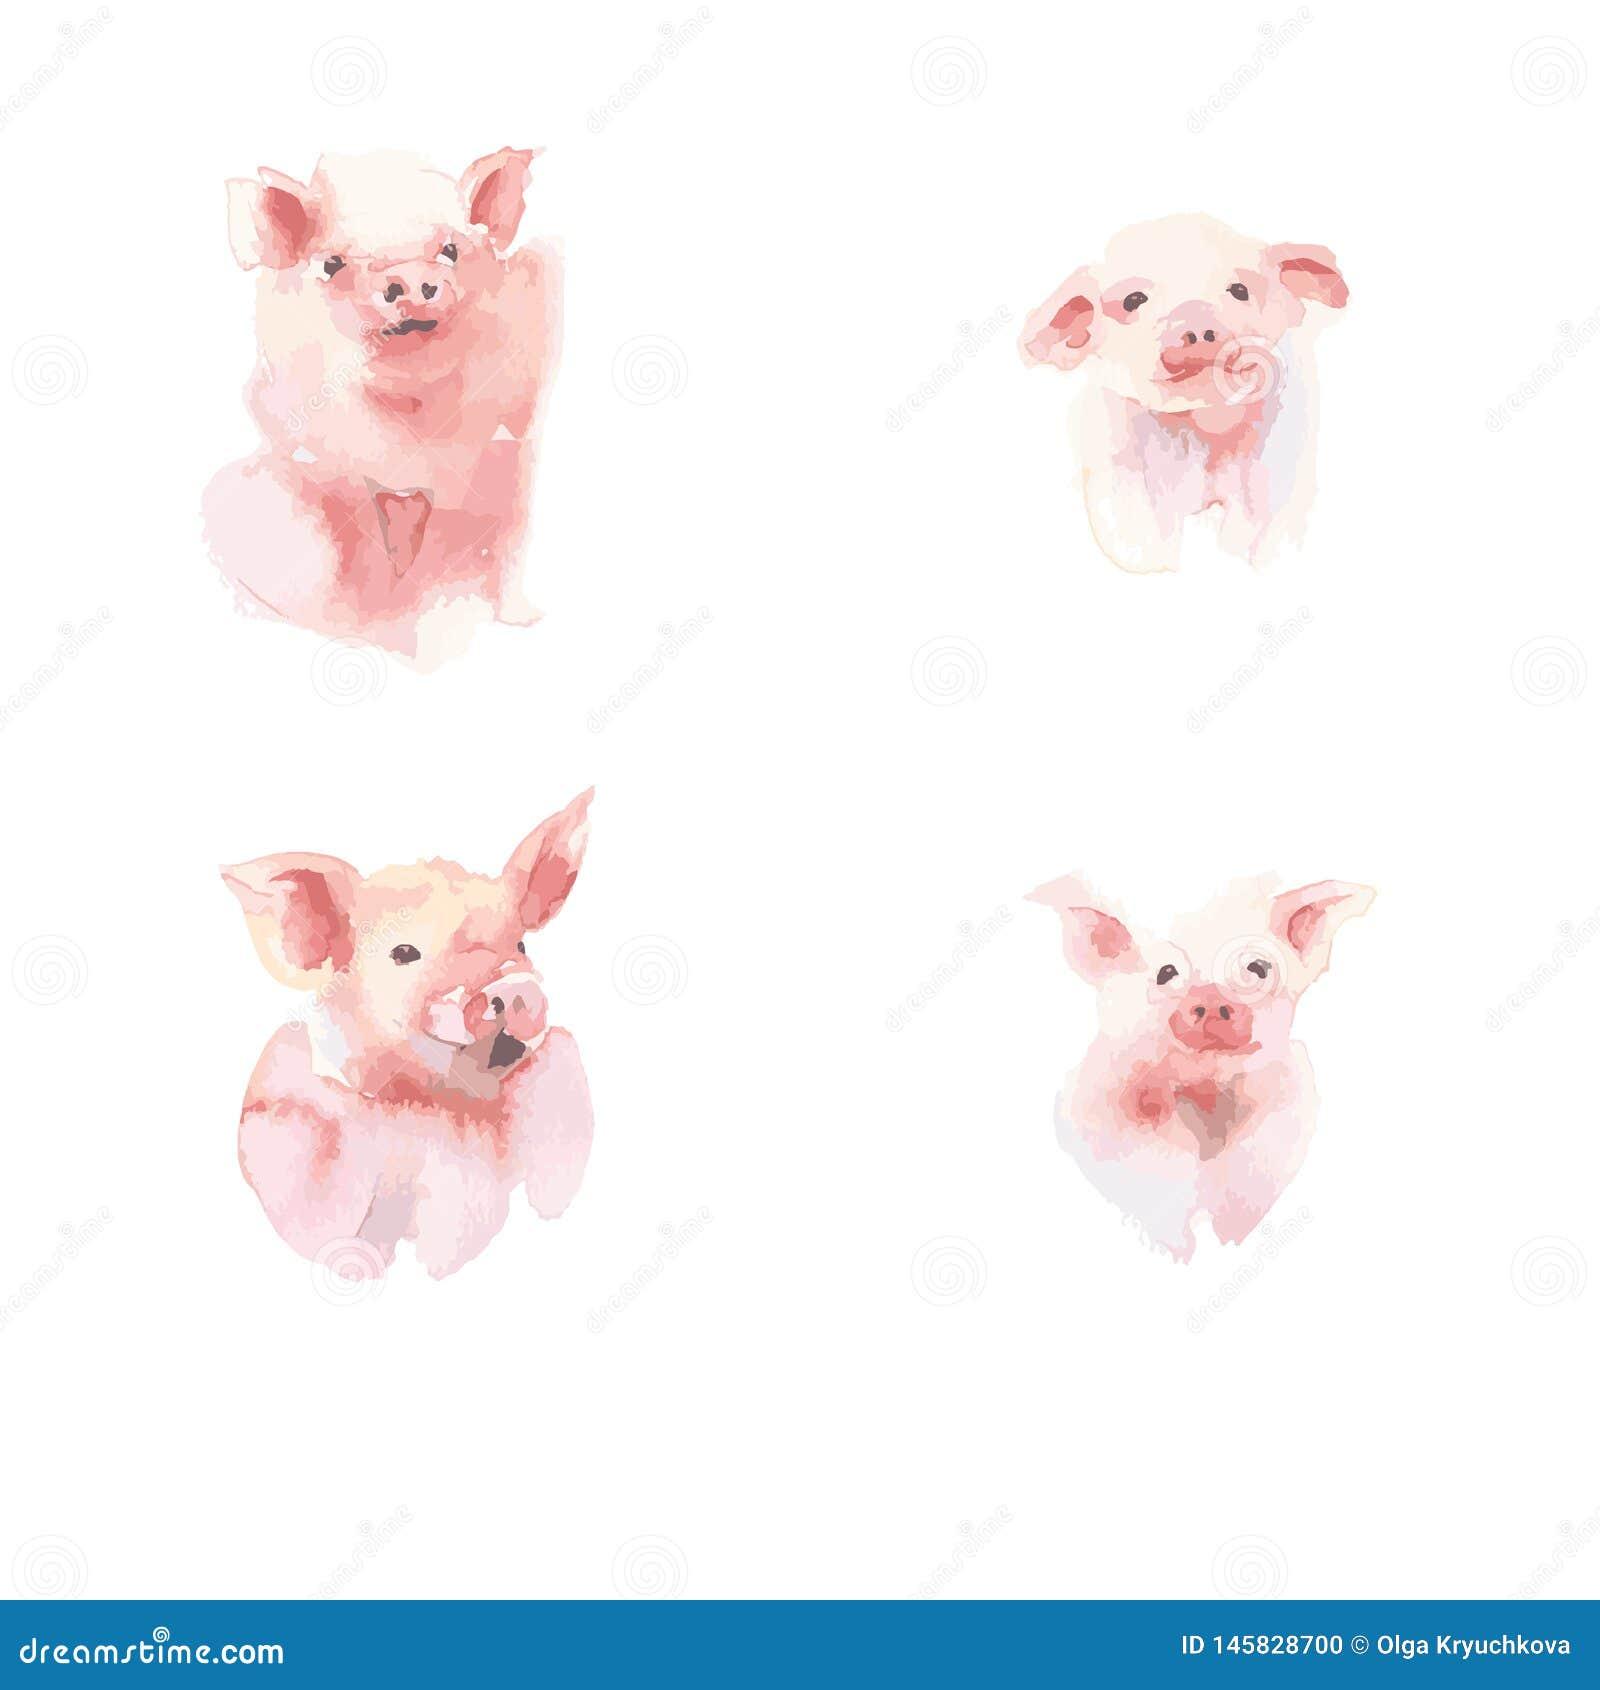 Watercolor vectors collection of little piggy. A variety of little piggy design.